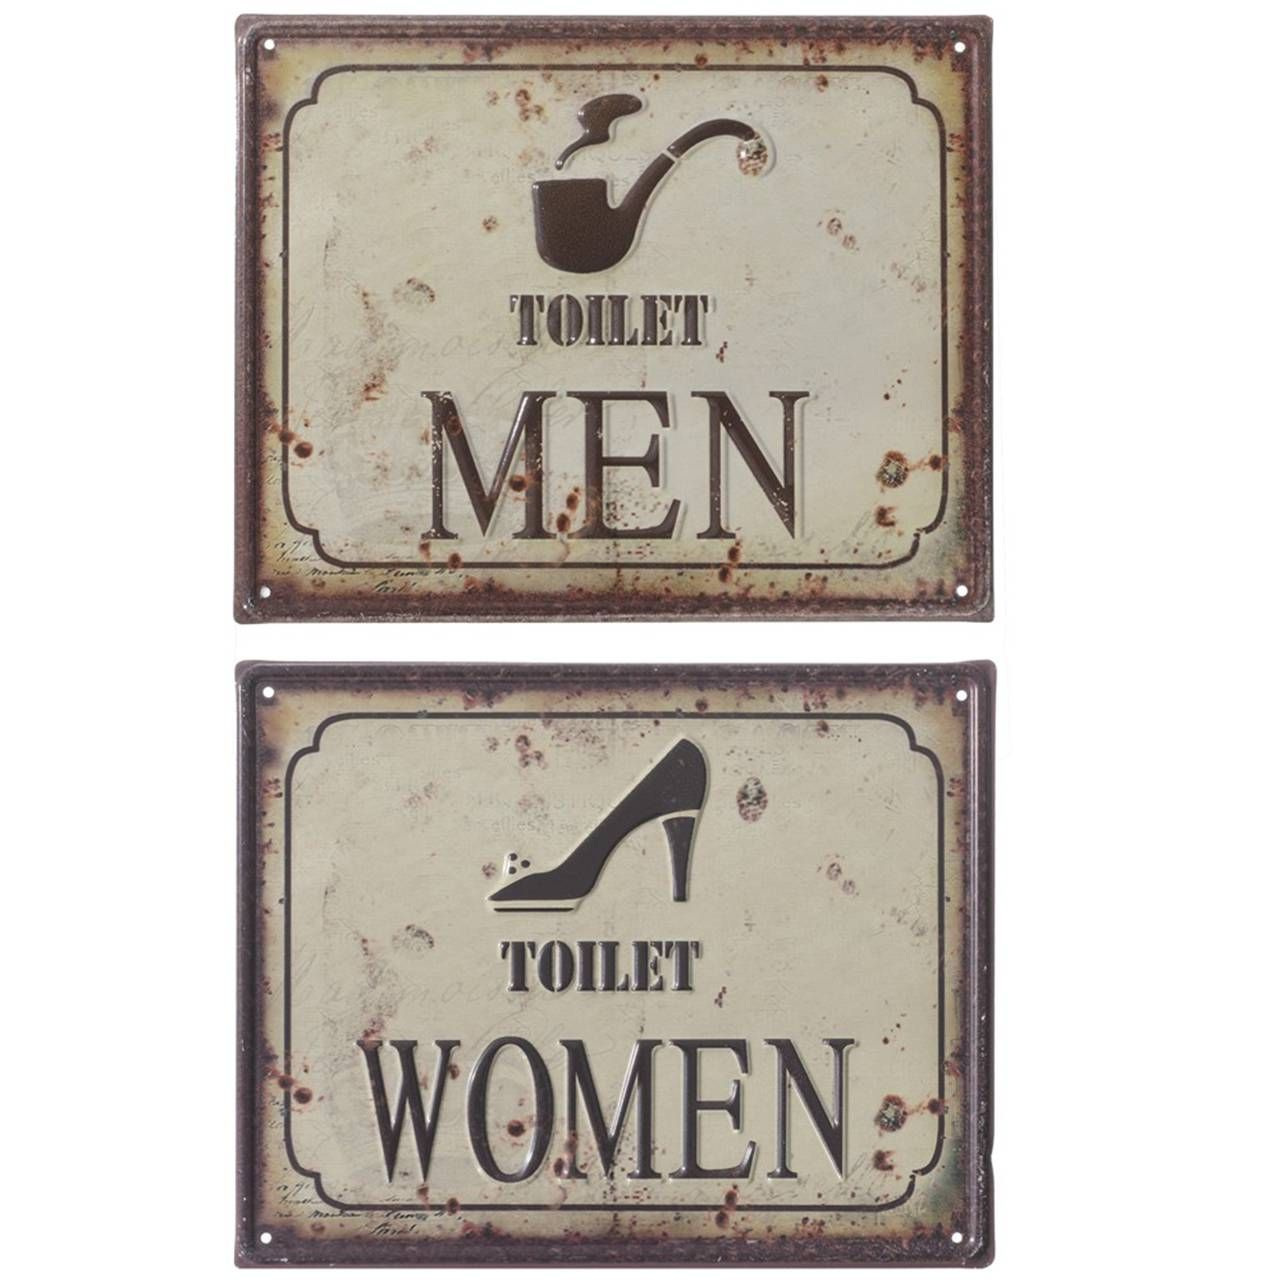 e5e0641ffcf7 Set de dos placas para #baño #hombre y #mujeres multicolor 25x20 cm ...